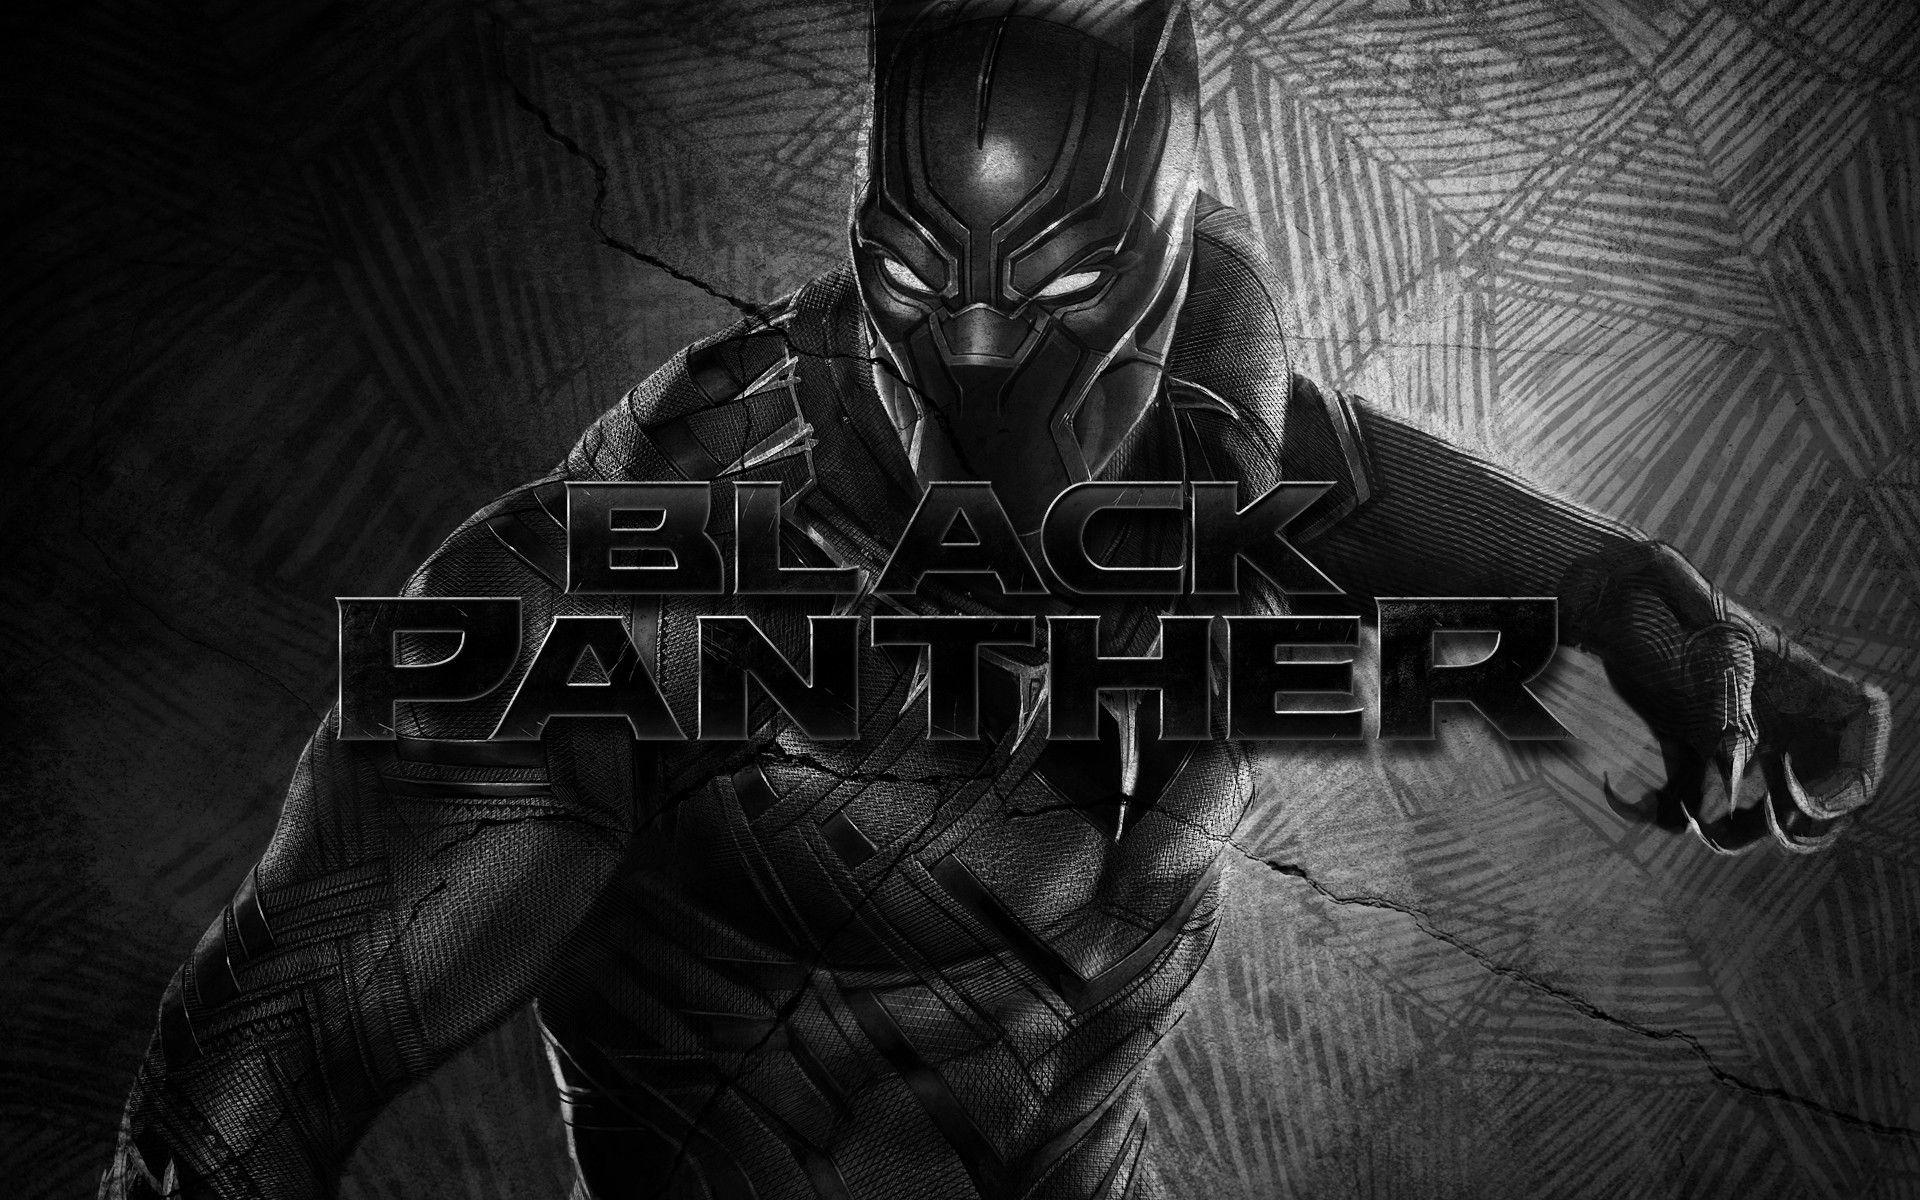 black panther hd wallpaper | epic car wallpapers | pinterest | black